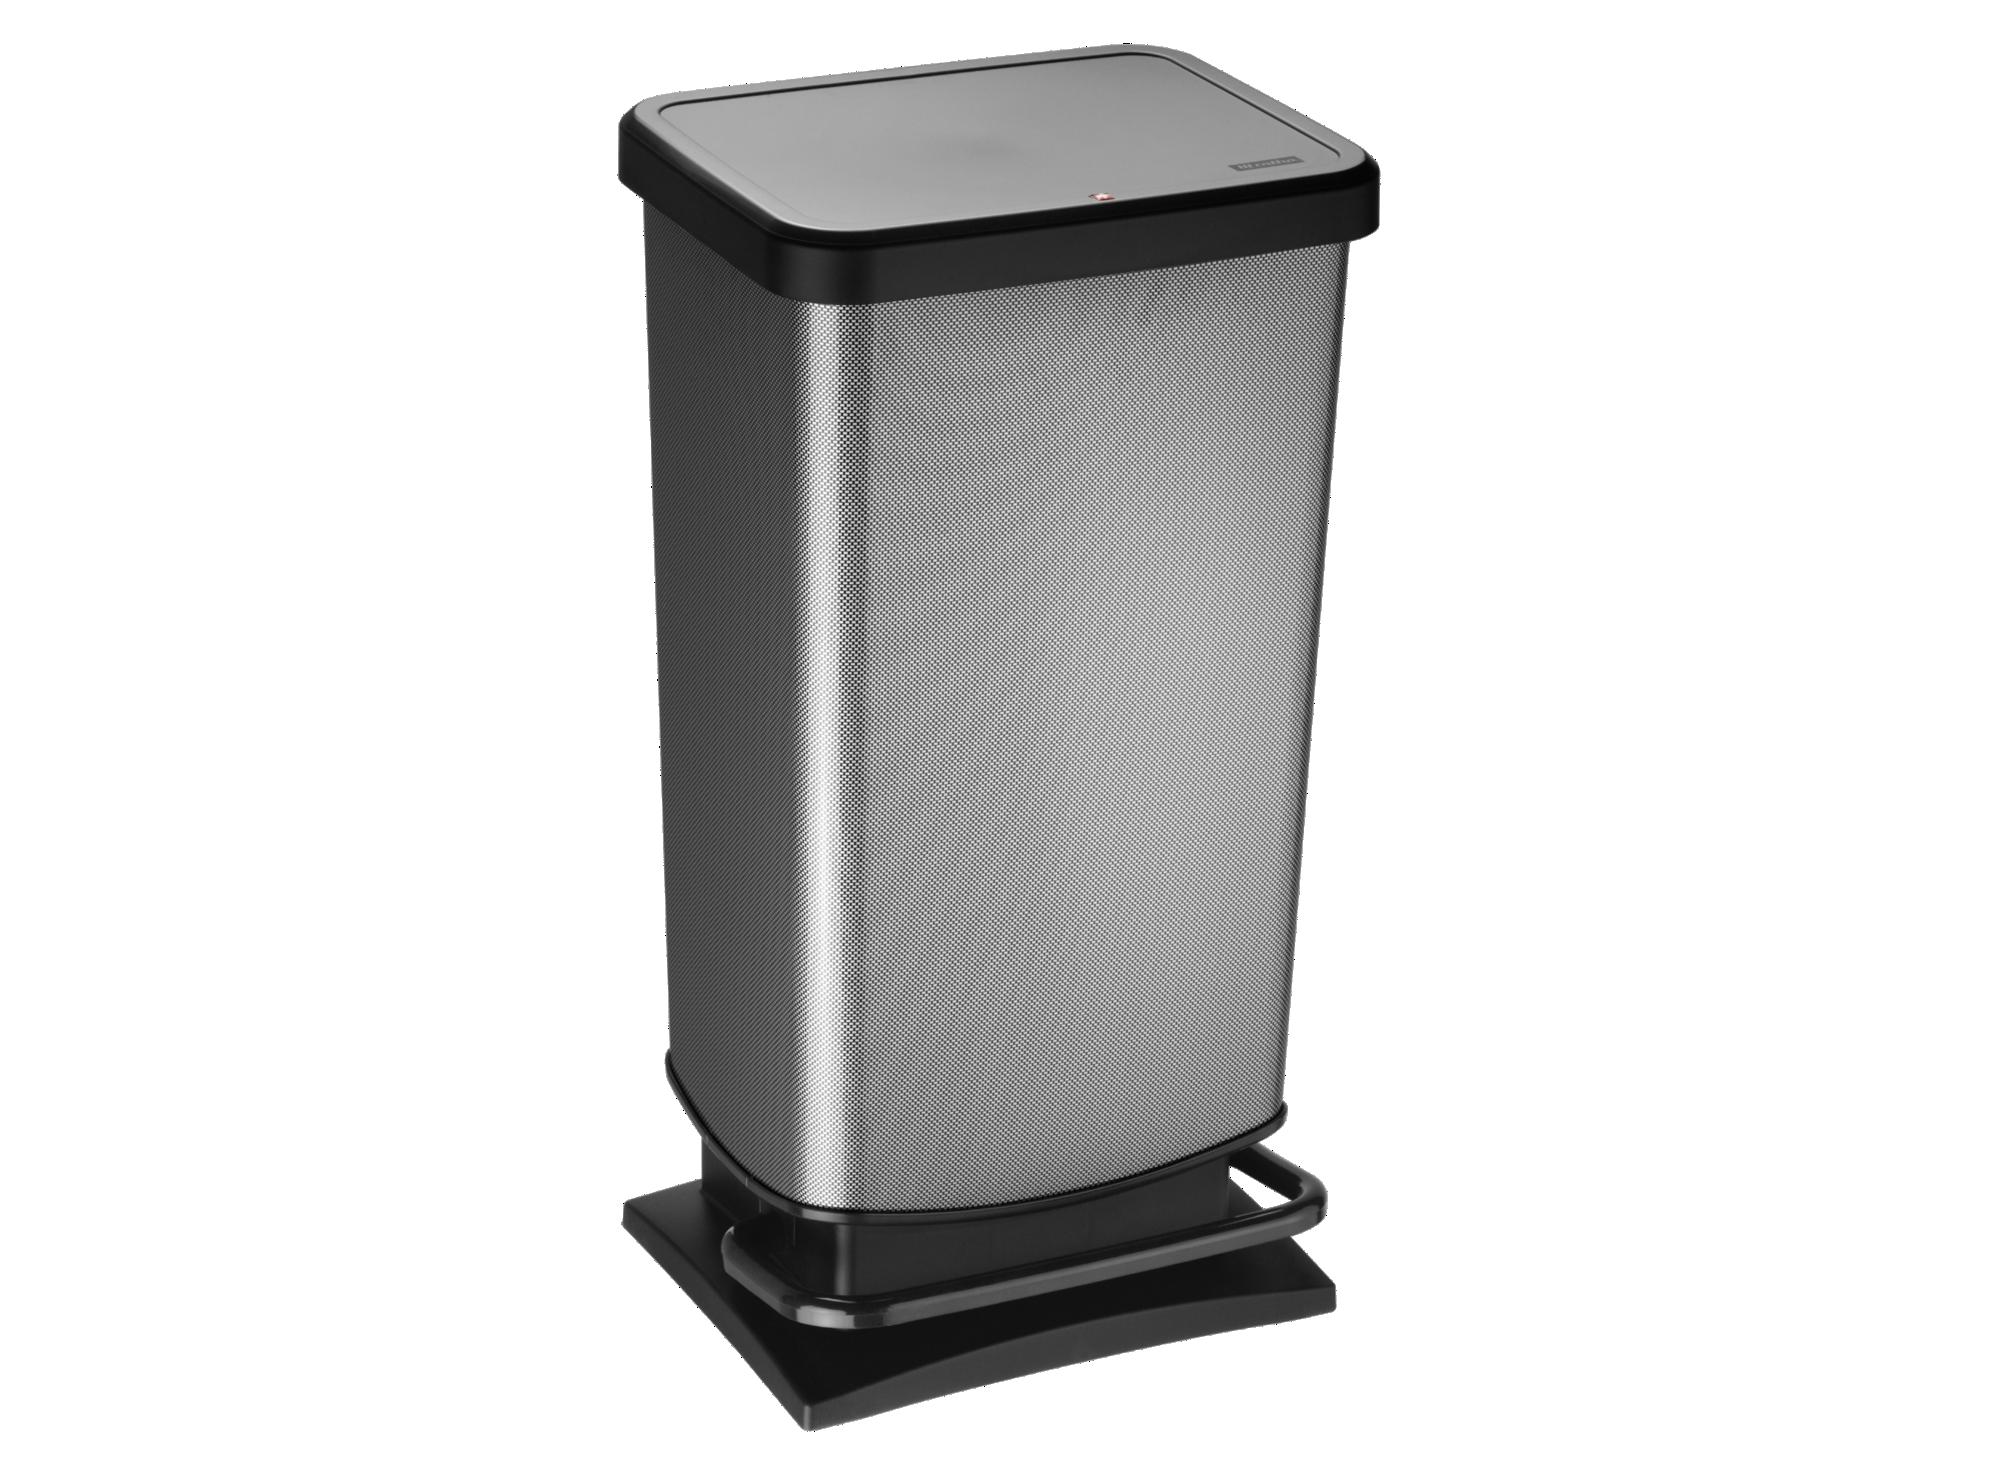 poubelle pedale 40l aspect carbone fly. Black Bedroom Furniture Sets. Home Design Ideas